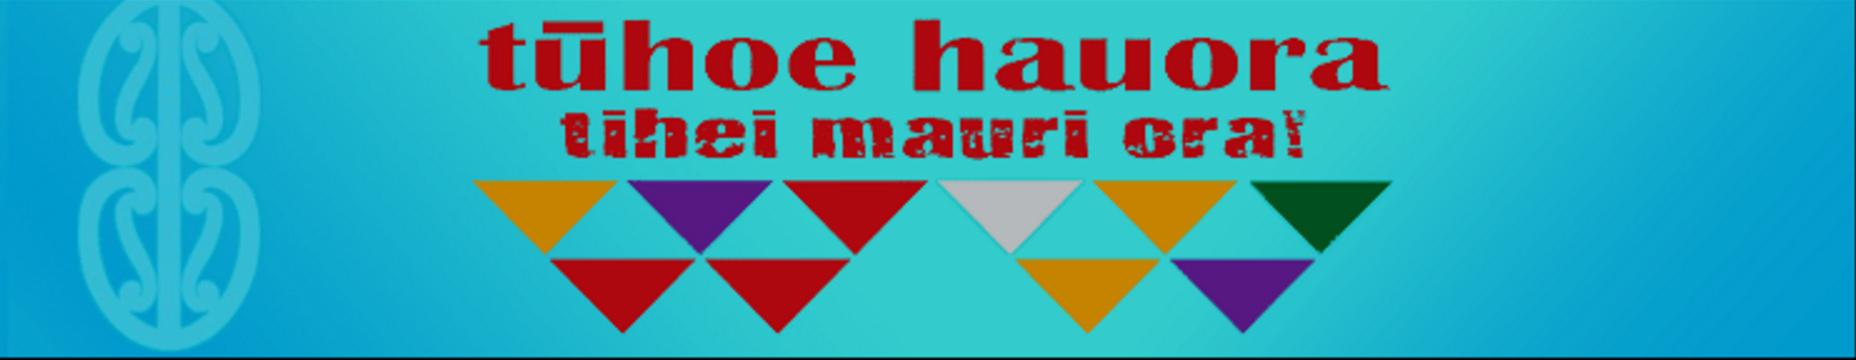 Tuhoe Haurora.jpg